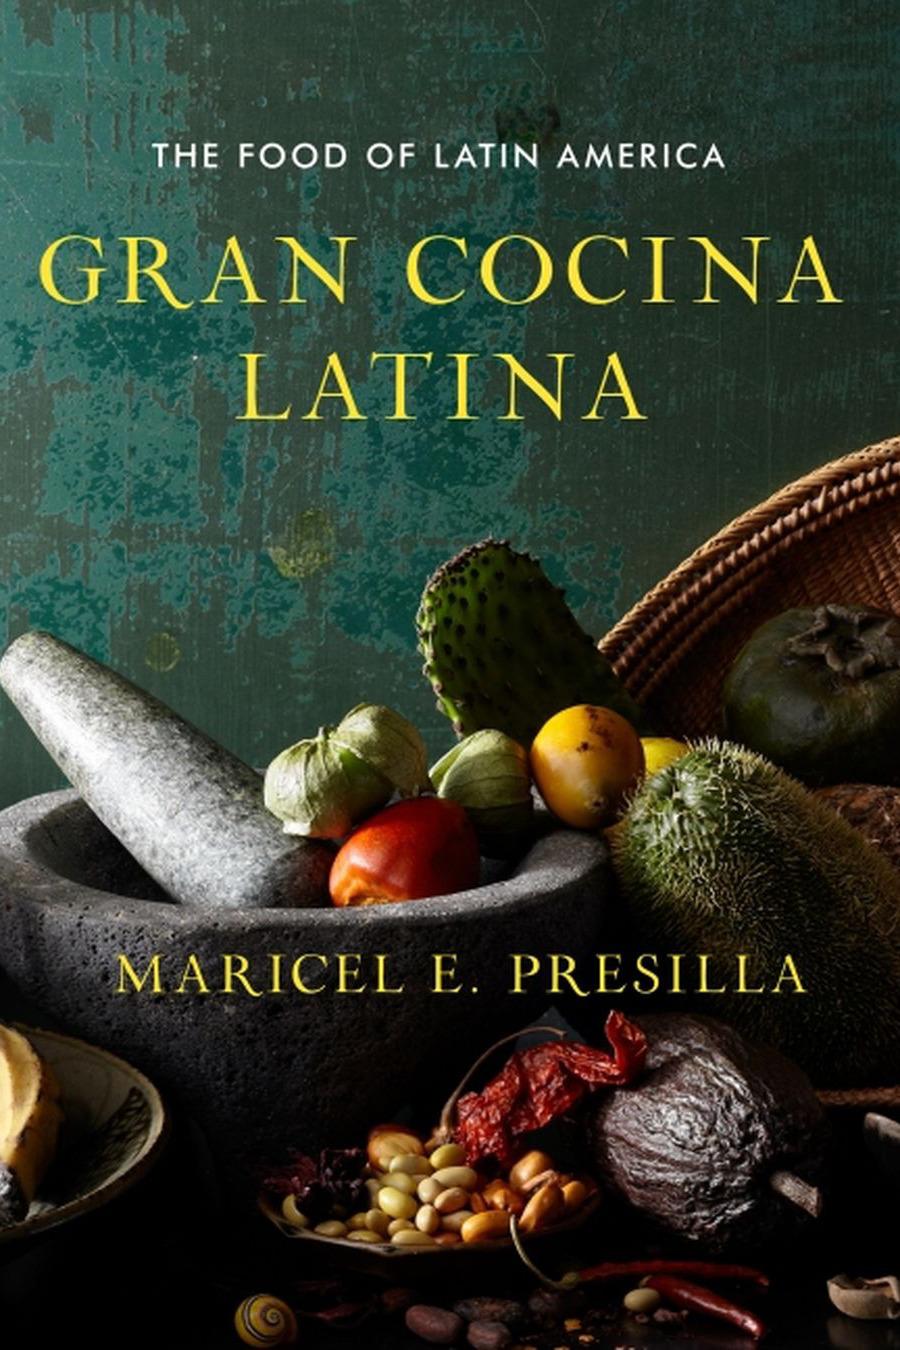 Gran Cocina Latina by Maricel Presilla